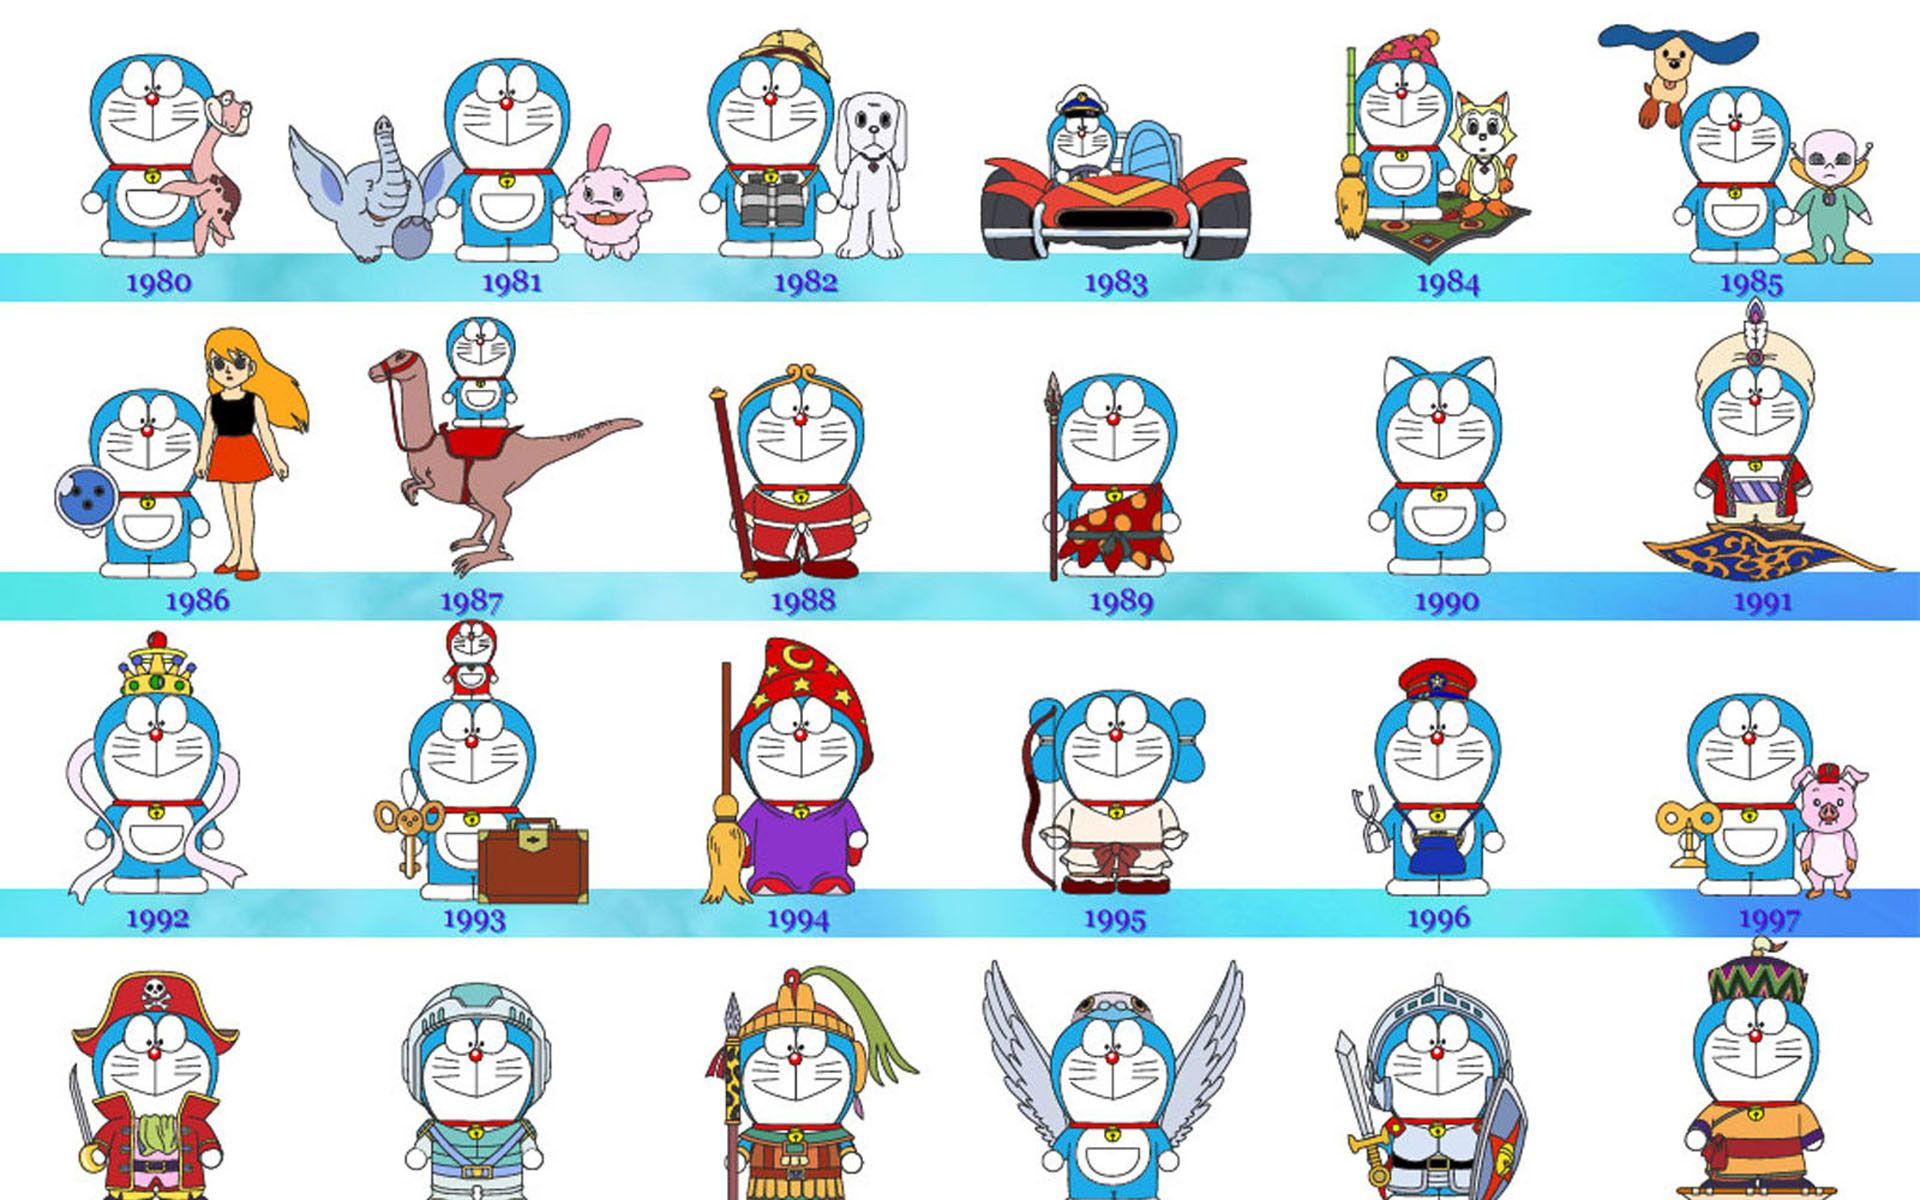 Doraemon Doraemon Gambar Nobita Doraemon LucuRumah And